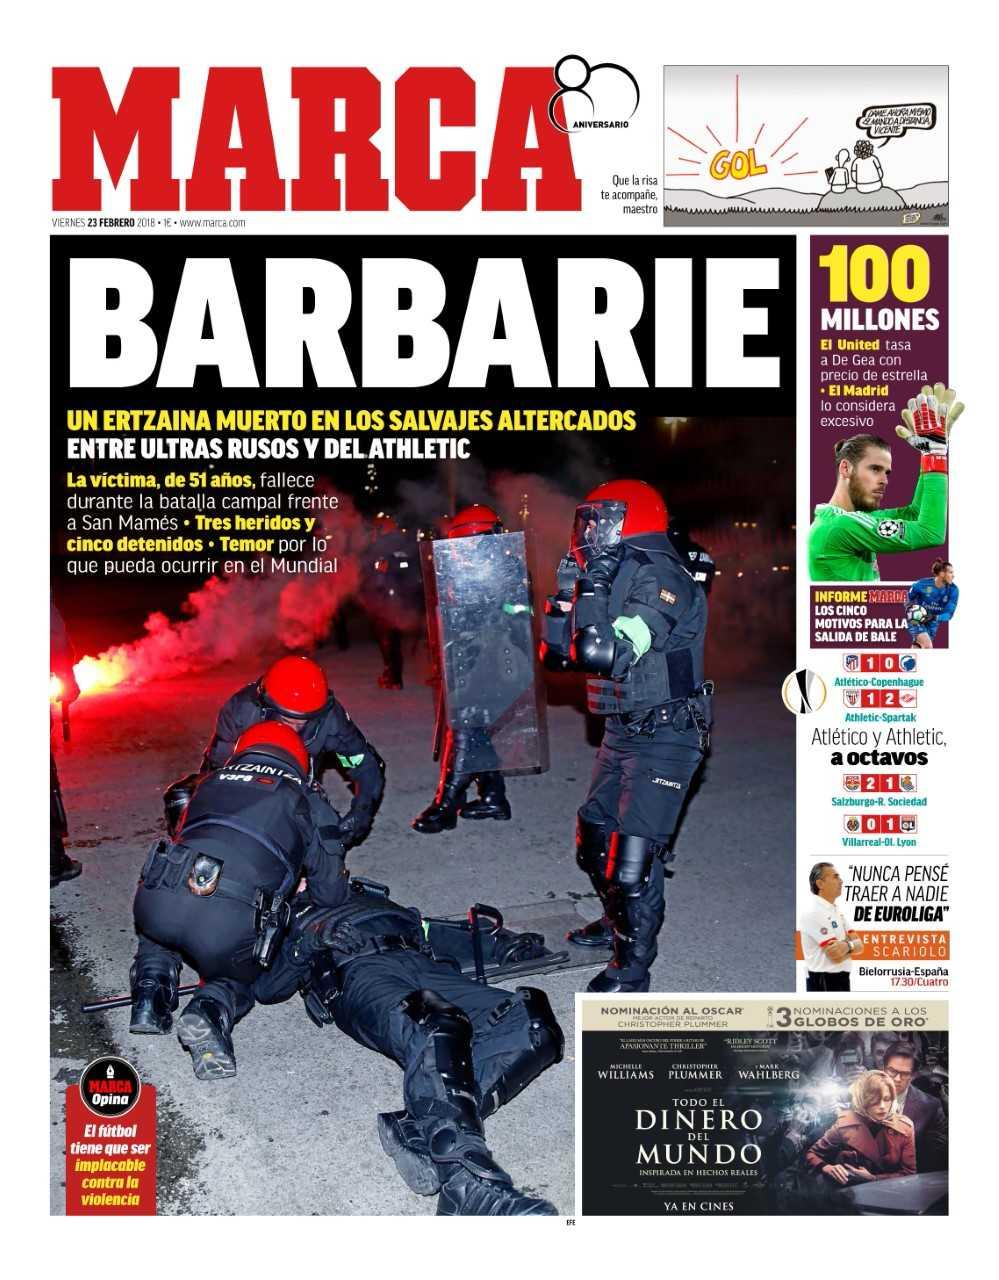 #LaPortada Barbarie https://t.co/xD2he2tqfJ